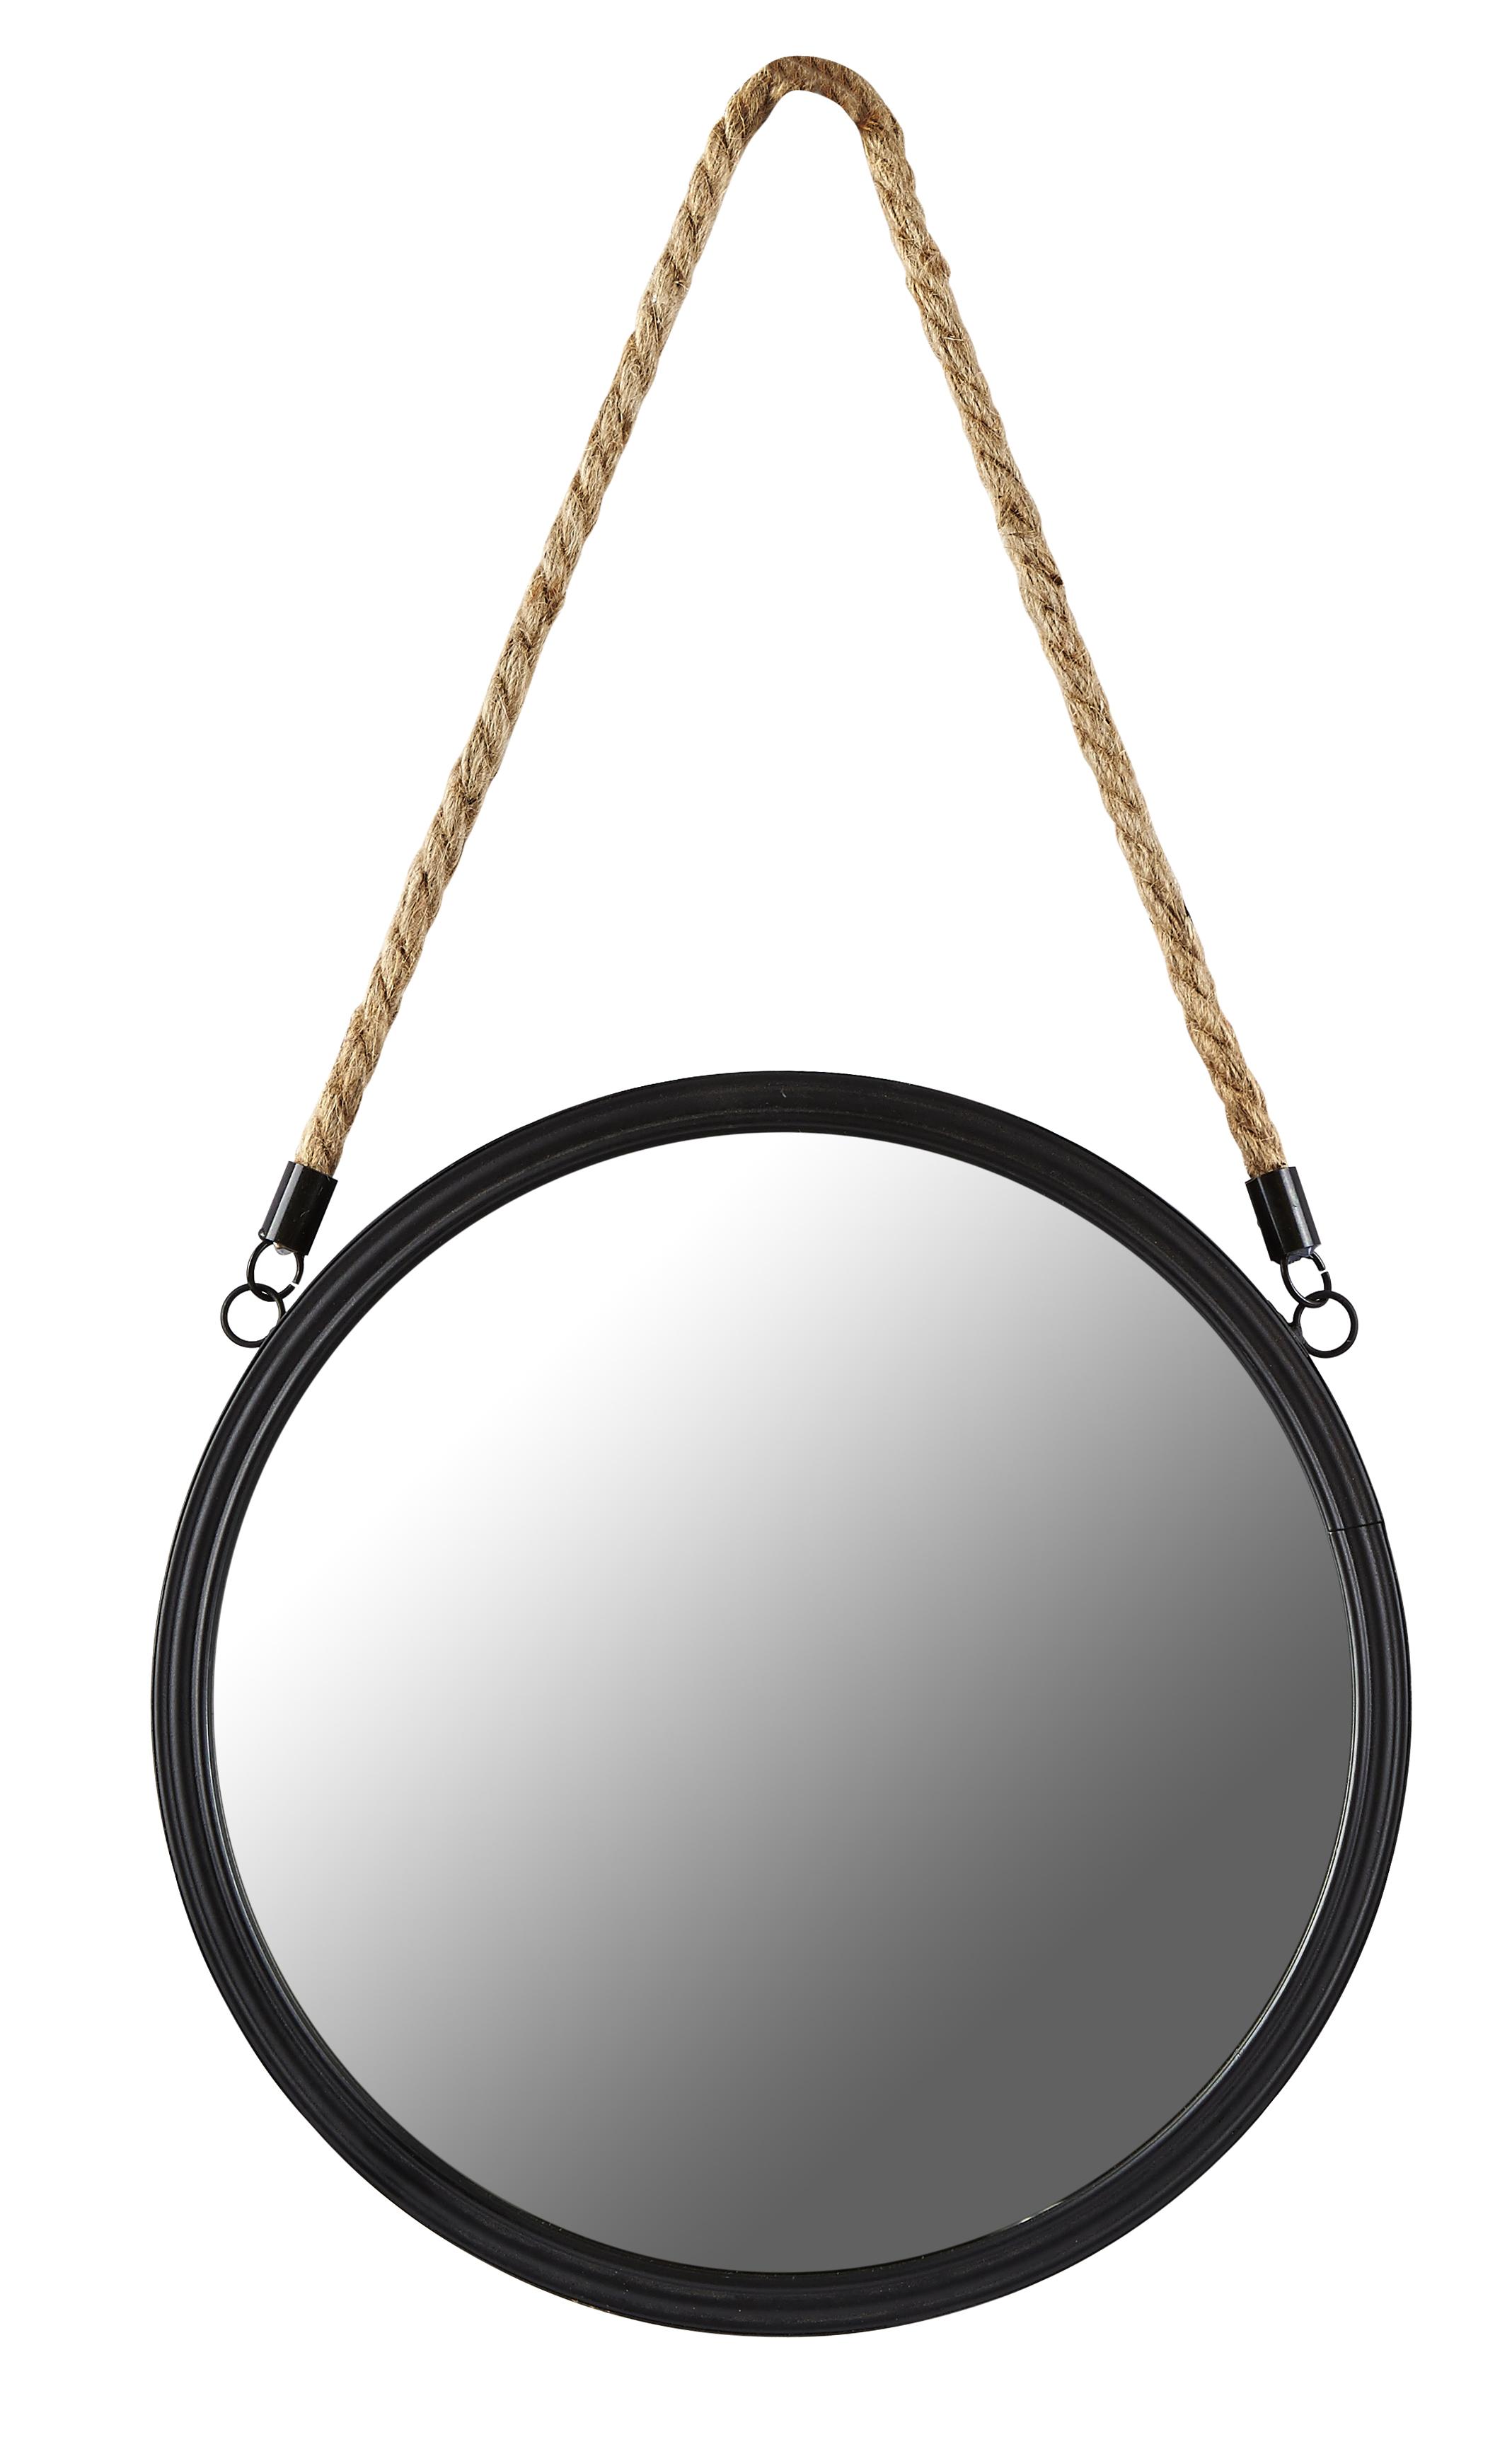 Spegel Metall Svart 30 cm